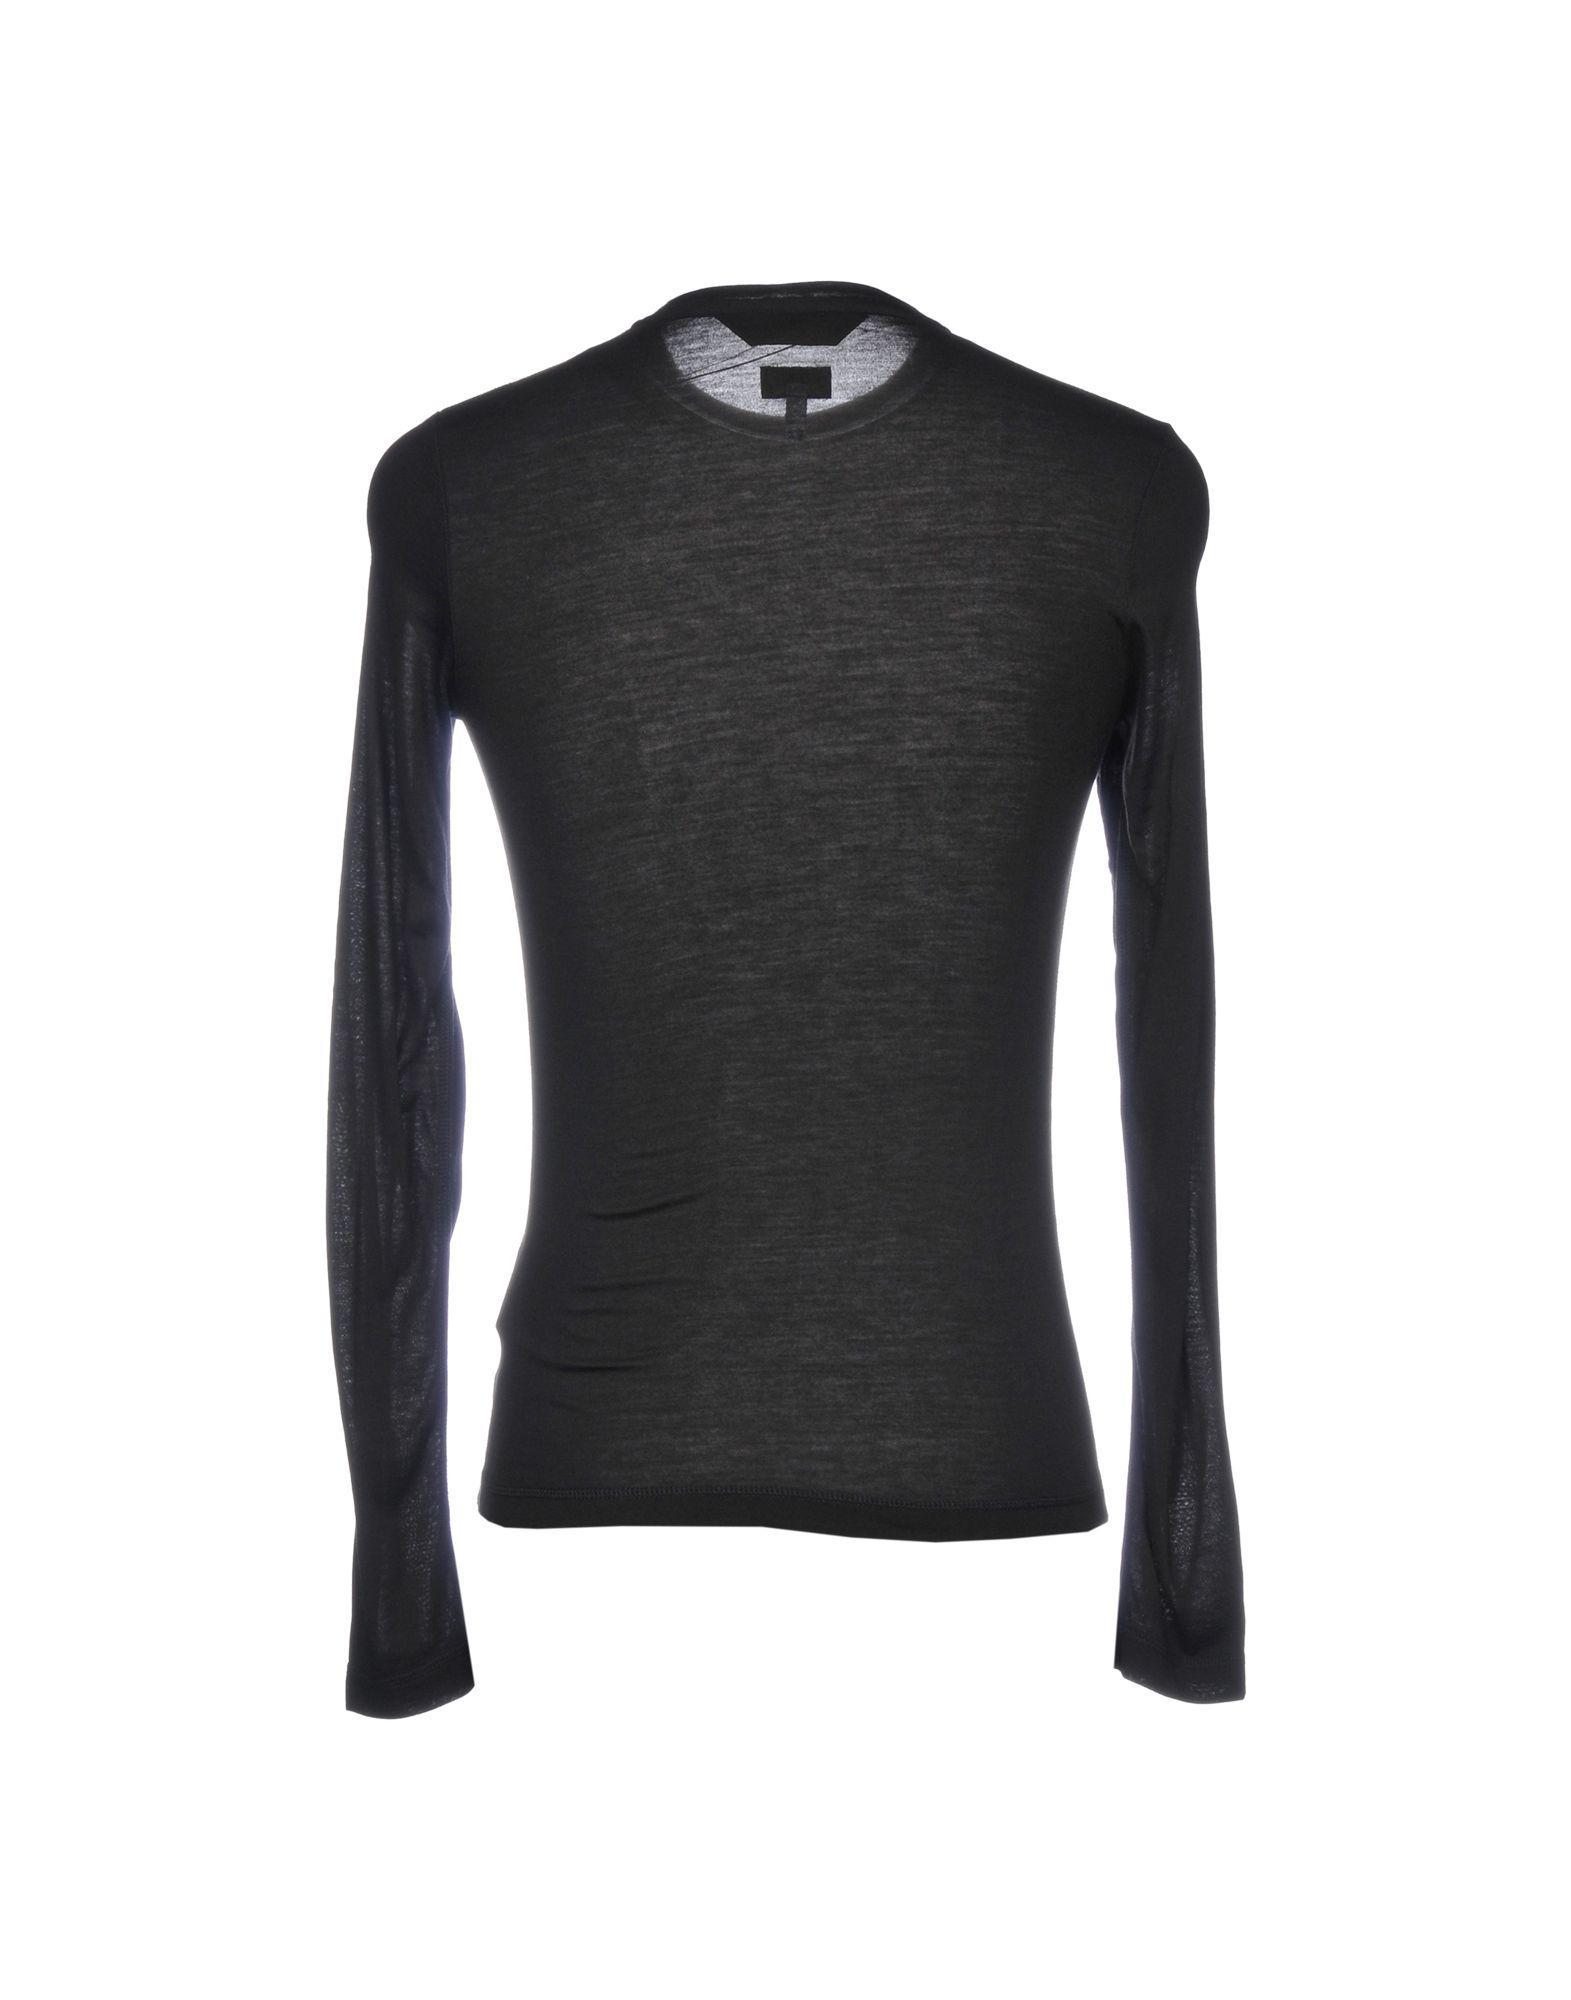 d4bb8b0600 Lyst - Armani Jeans T-shirt in Black for Men